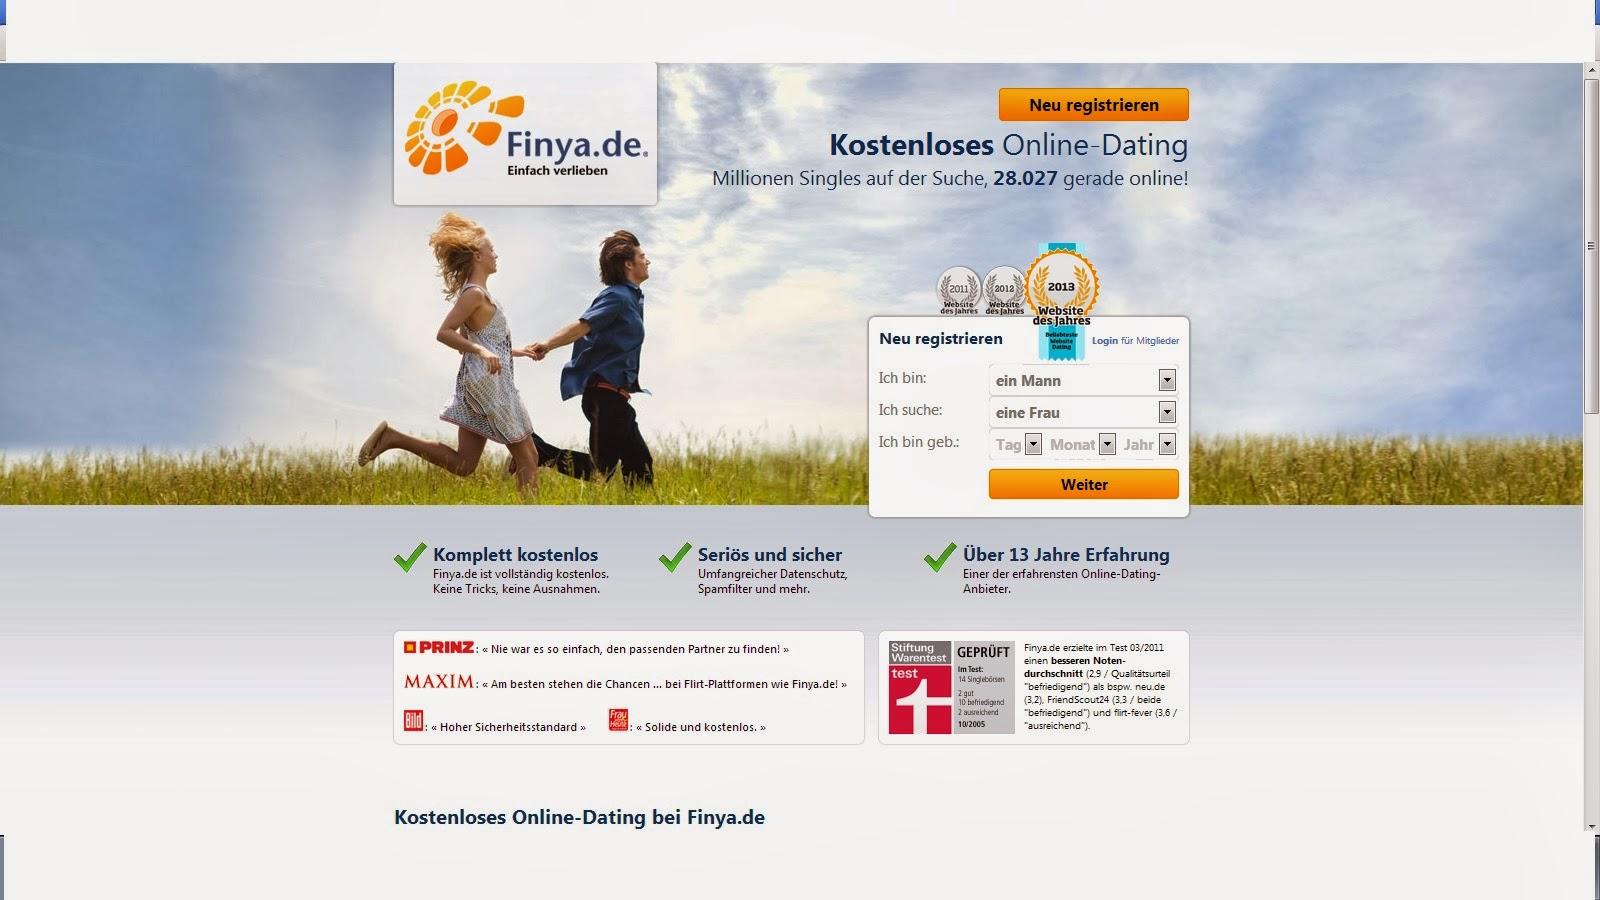 Kostenloses online-dating-profil